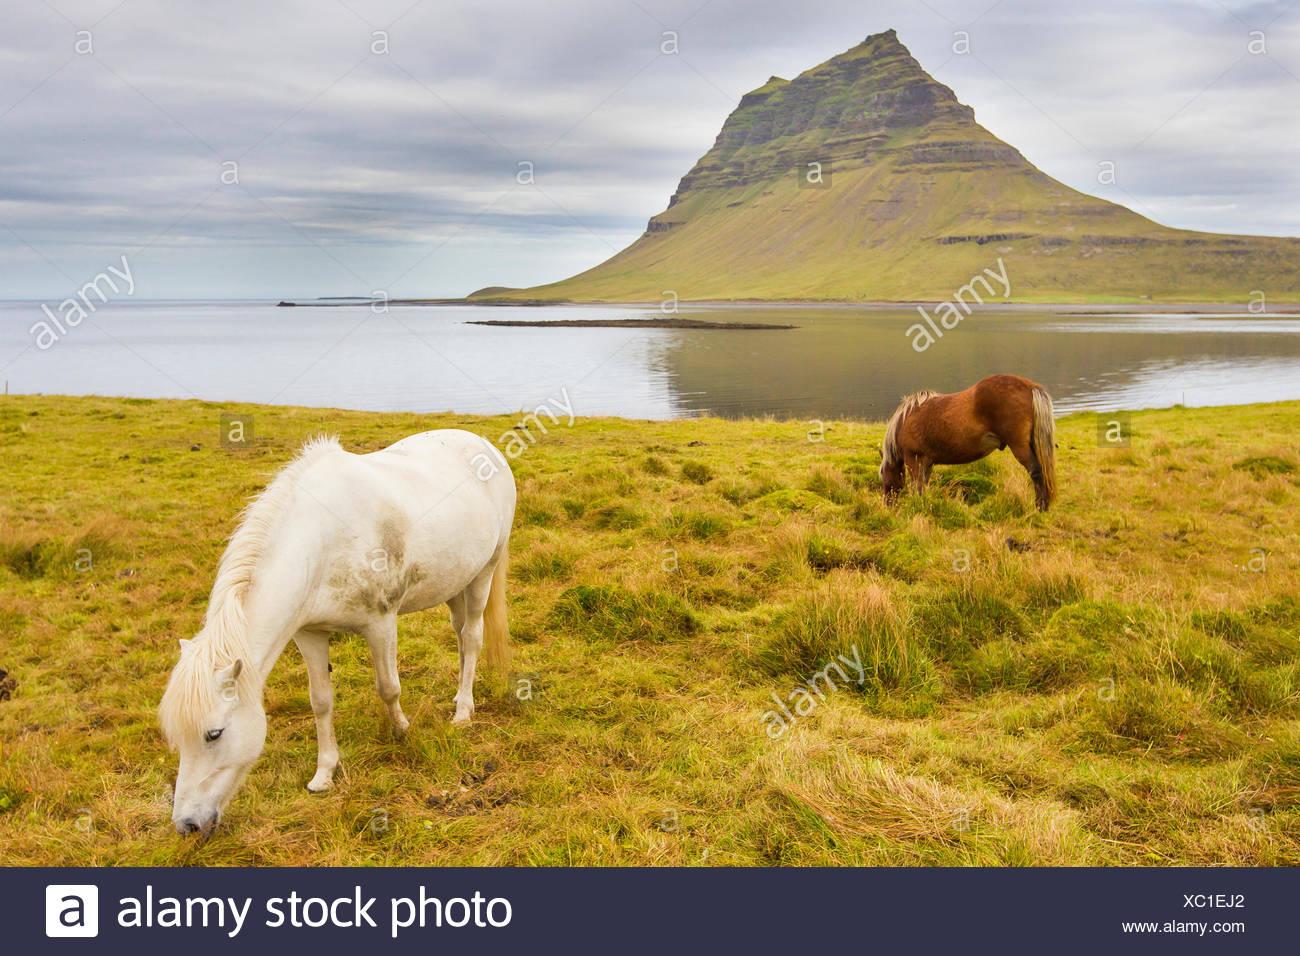 Horses grazing in a meadow near Kirkjufell Mountain, on Iceland's coast. - Stock Image